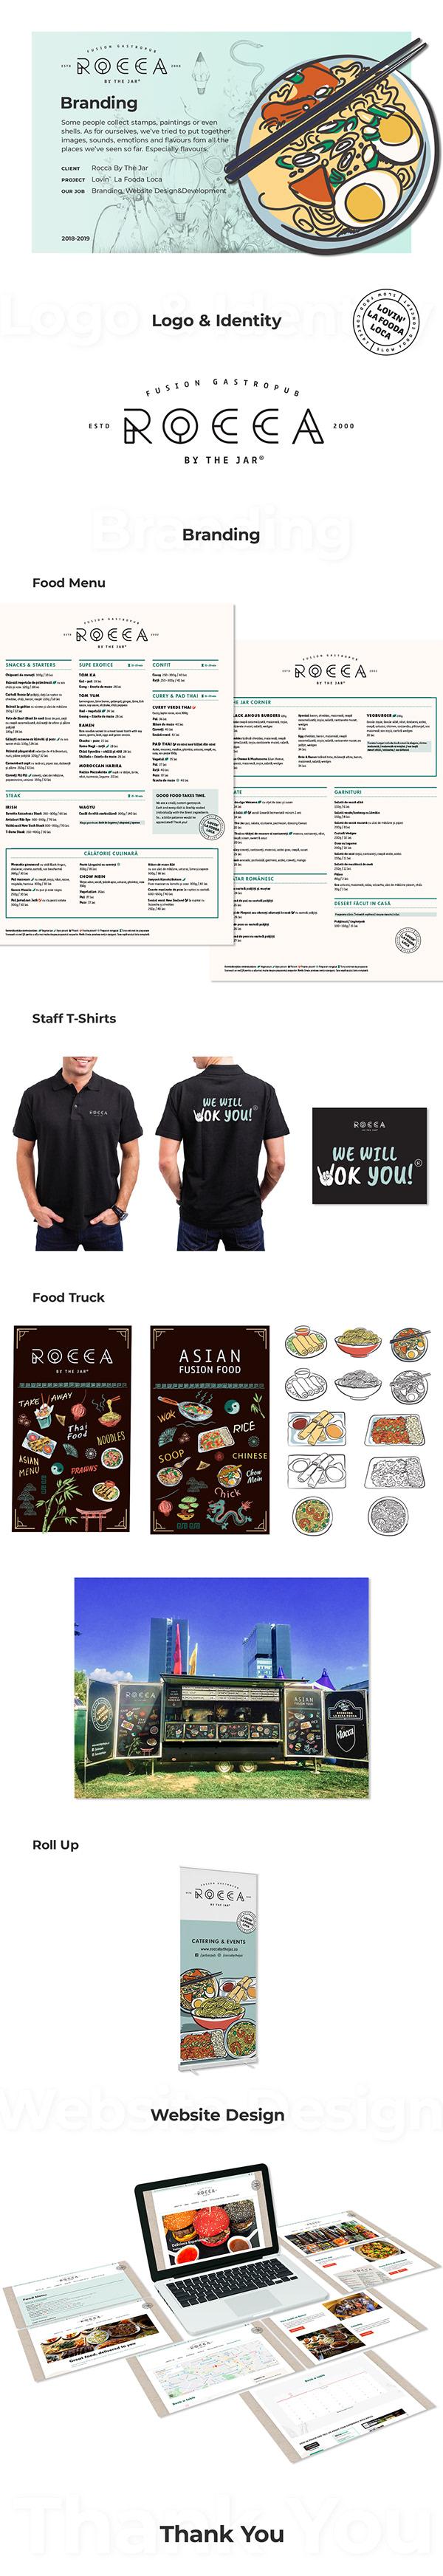 Rocca by the Jar - Restaurant Branding